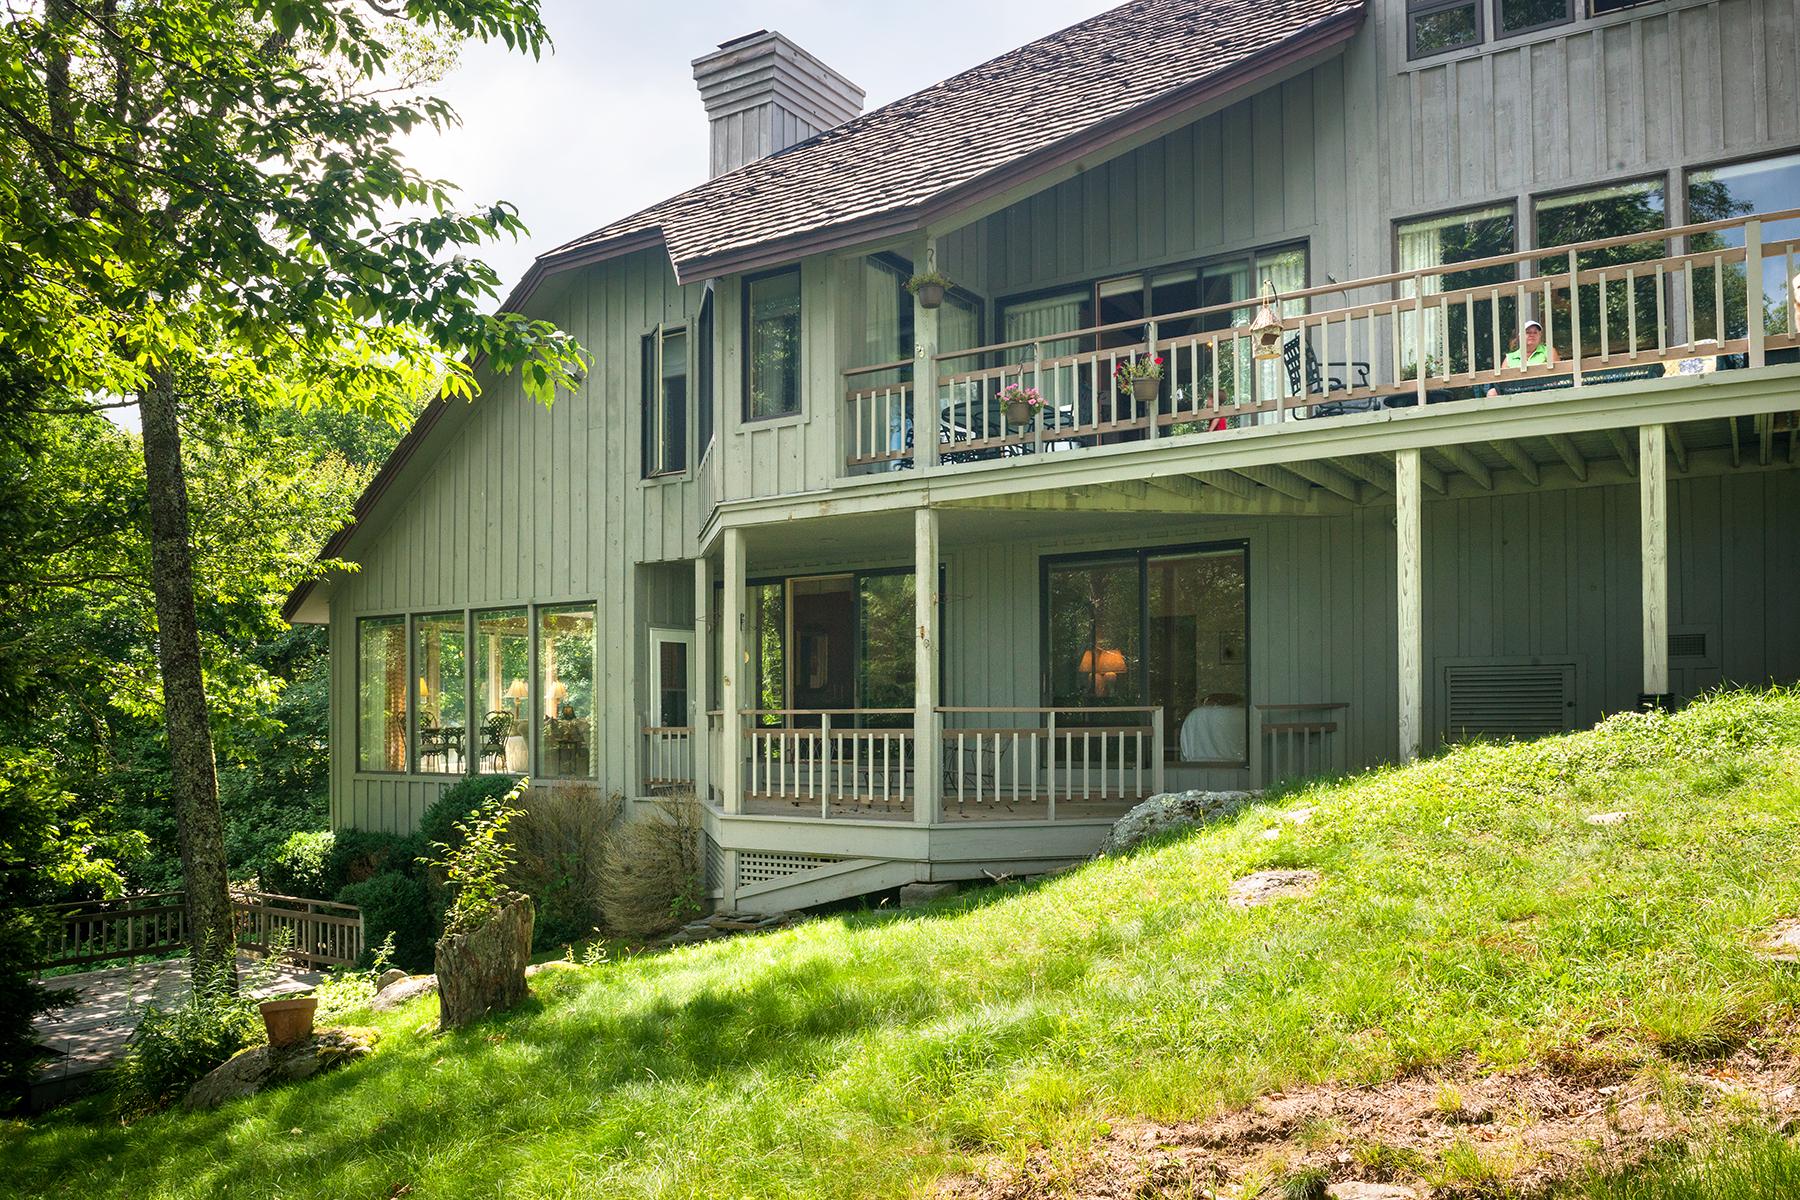 Condomínio para Venda às LINVILLE - LINVILLE RIDGE 101 Branlaire Linville, Carolina Do Norte, 28646 Estados Unidos